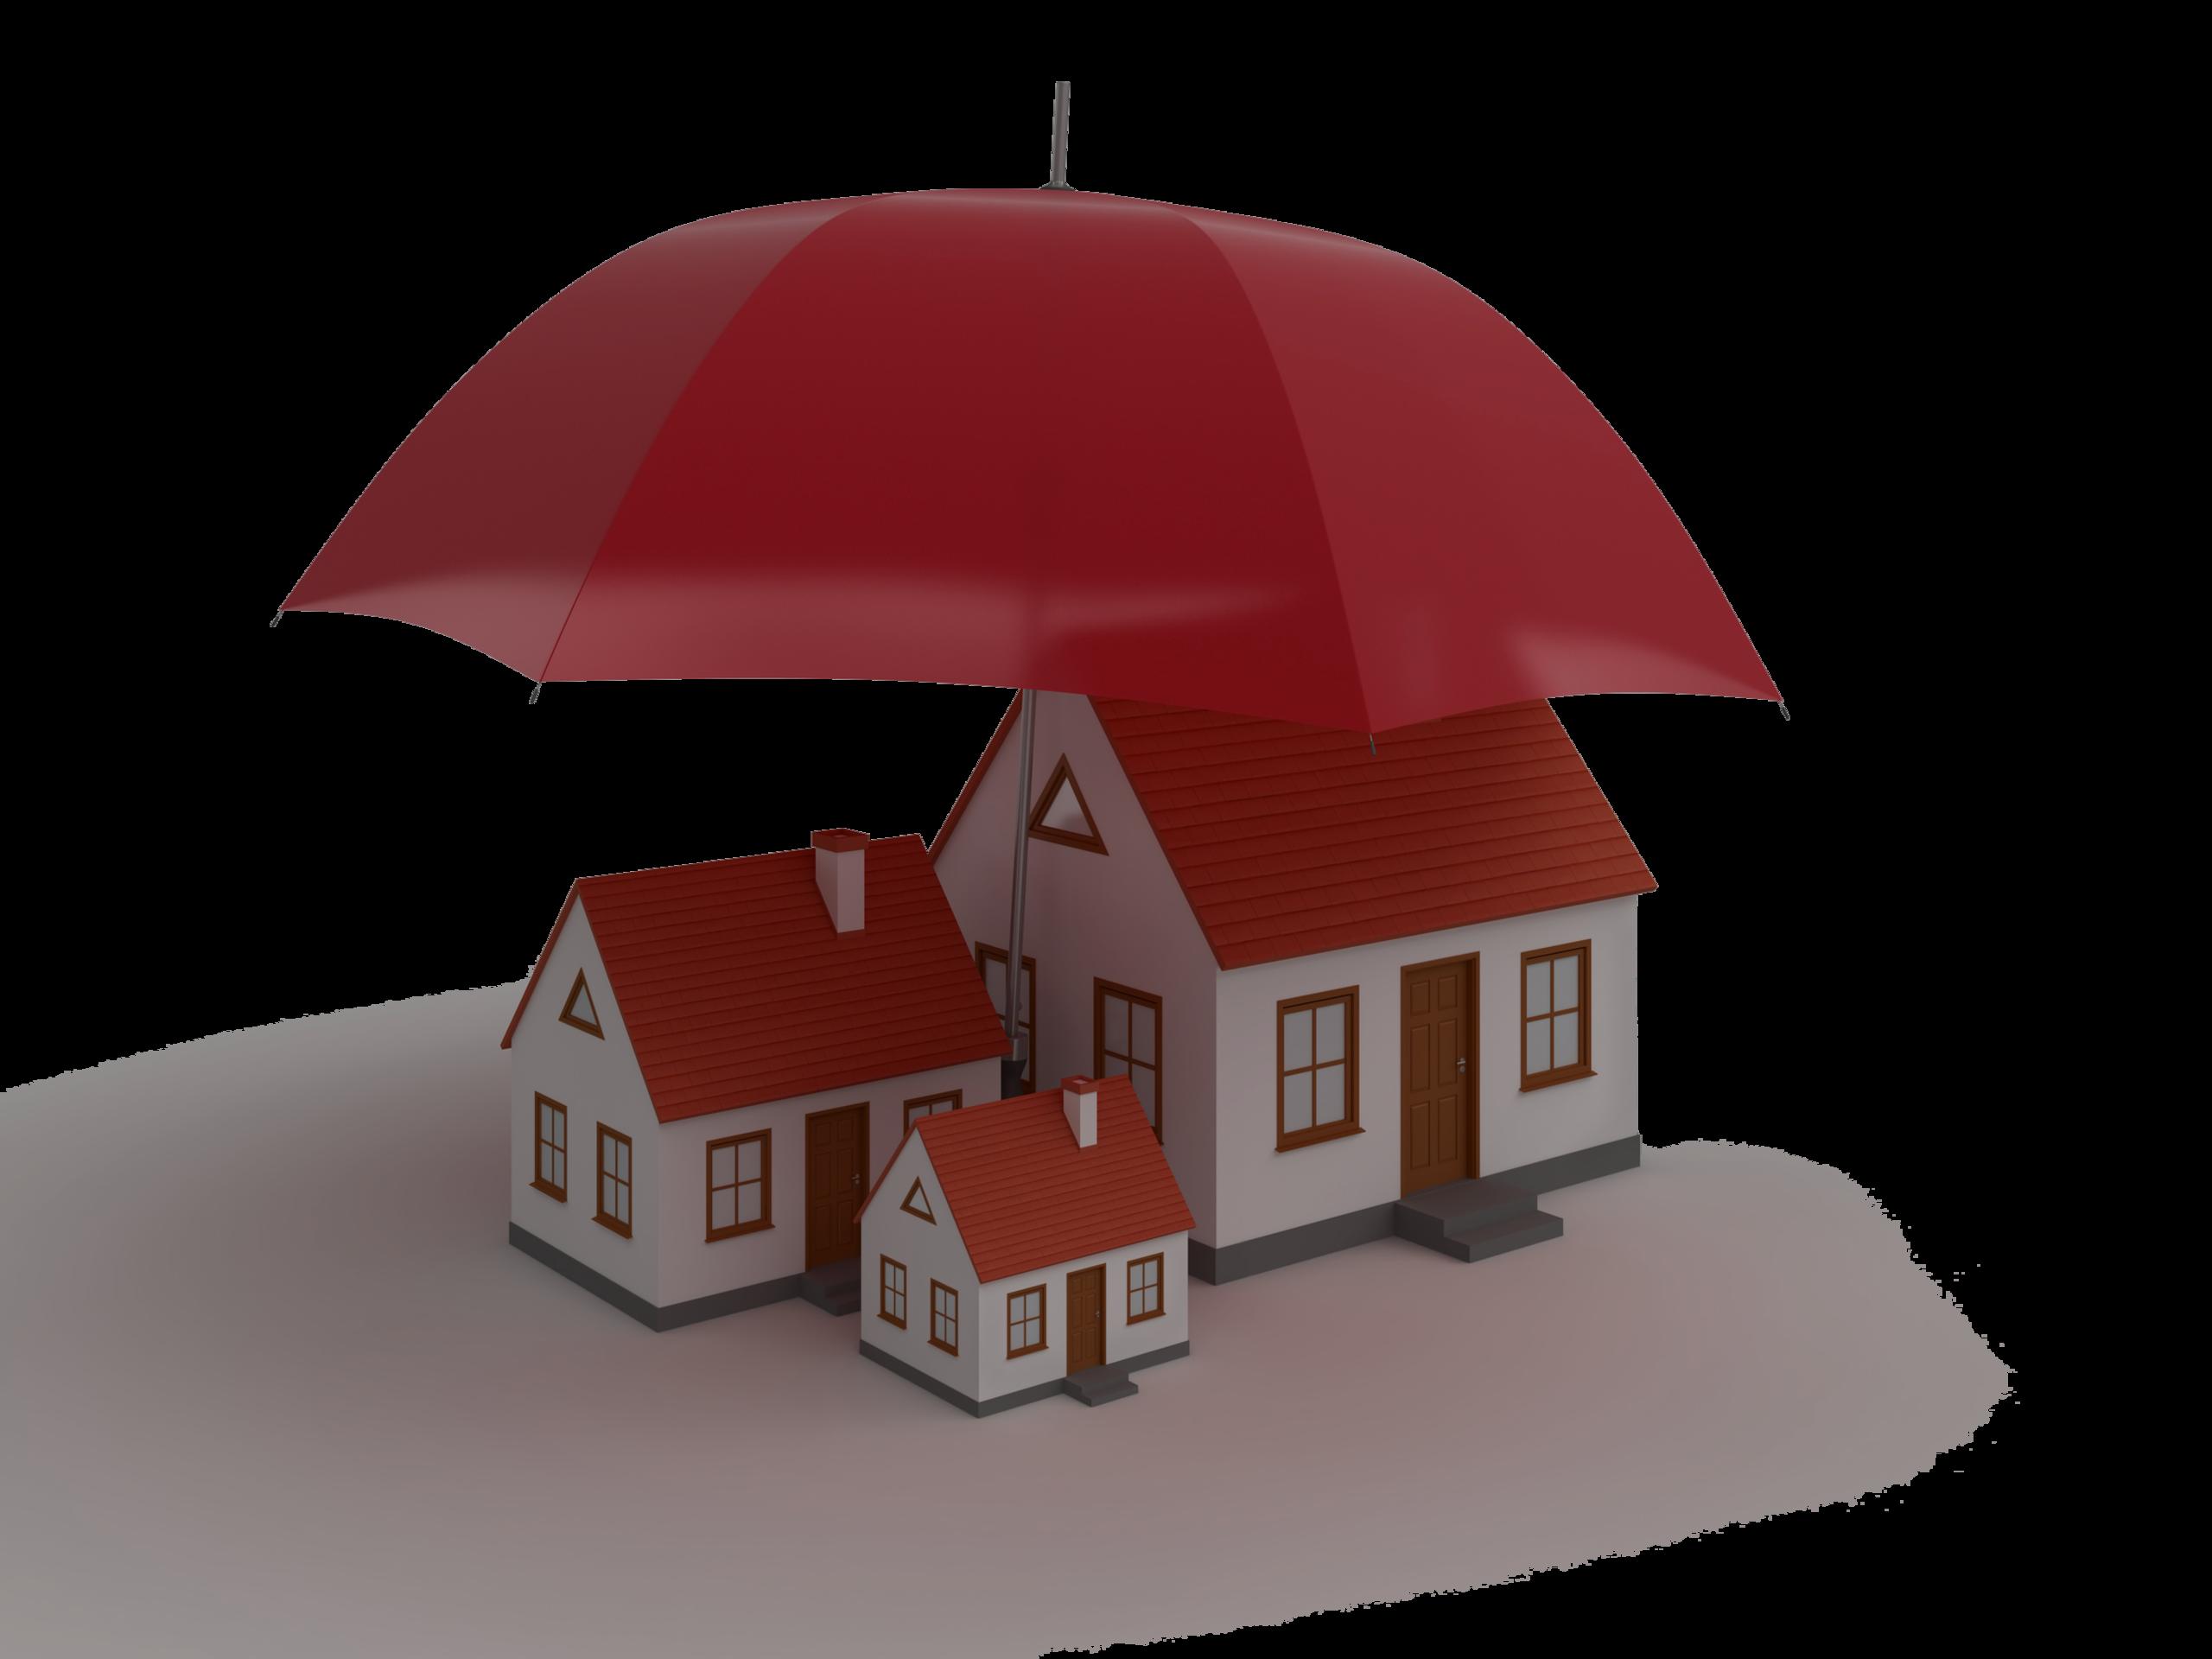 Disability insurance, life insurance: real estate the secret insurance tool